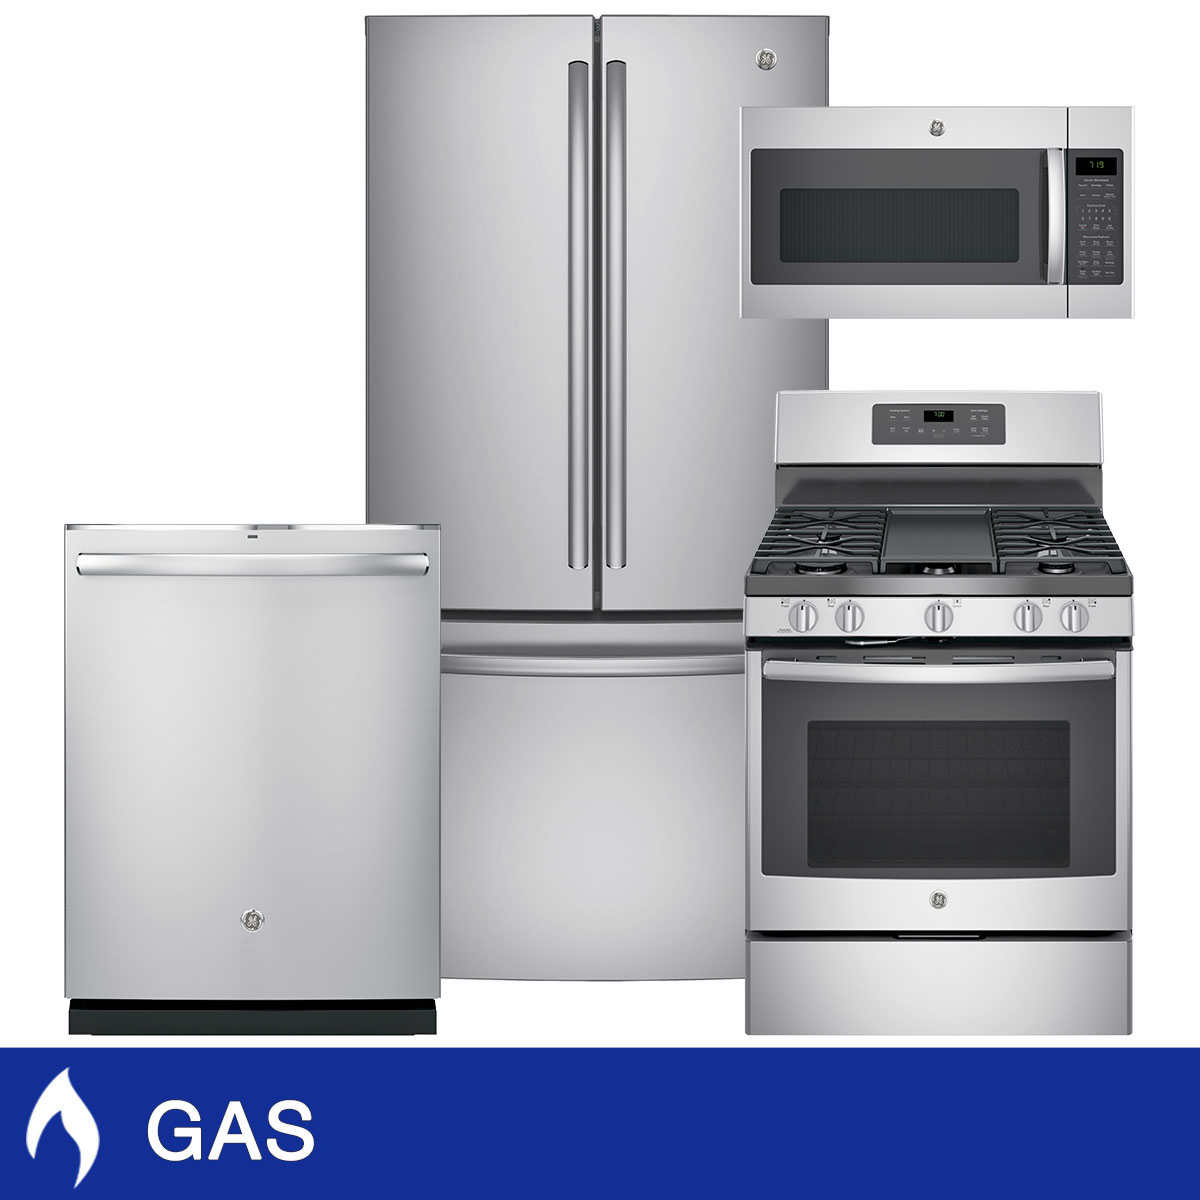 GE 4-piece GAS 24.8CuFt French Door Kitchen Package in Stainless Steel